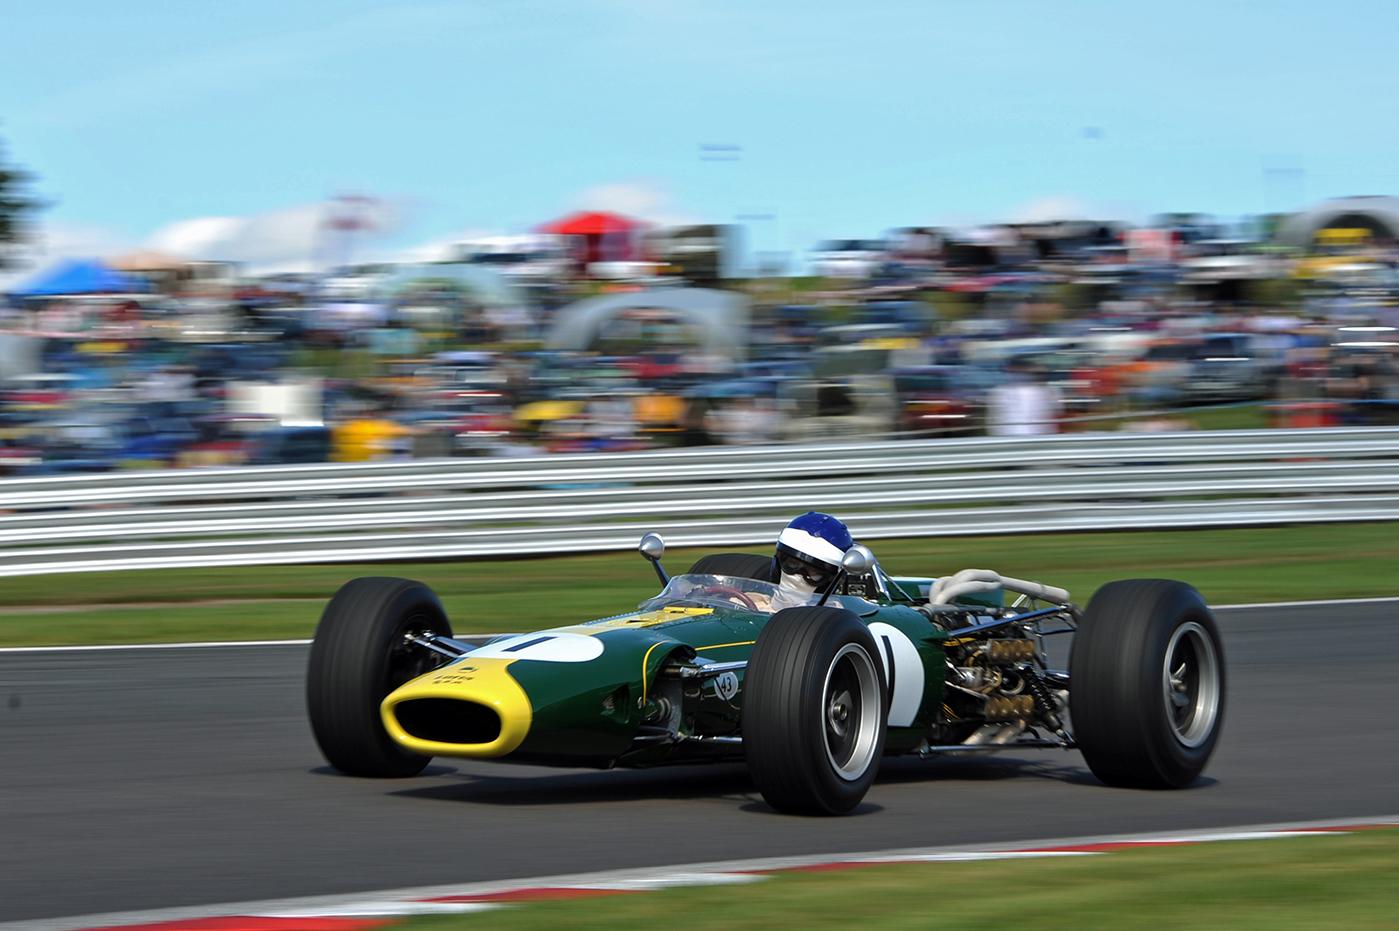 Lotus 43-BRM returns to Oulton Park | Motor Sport Magazine